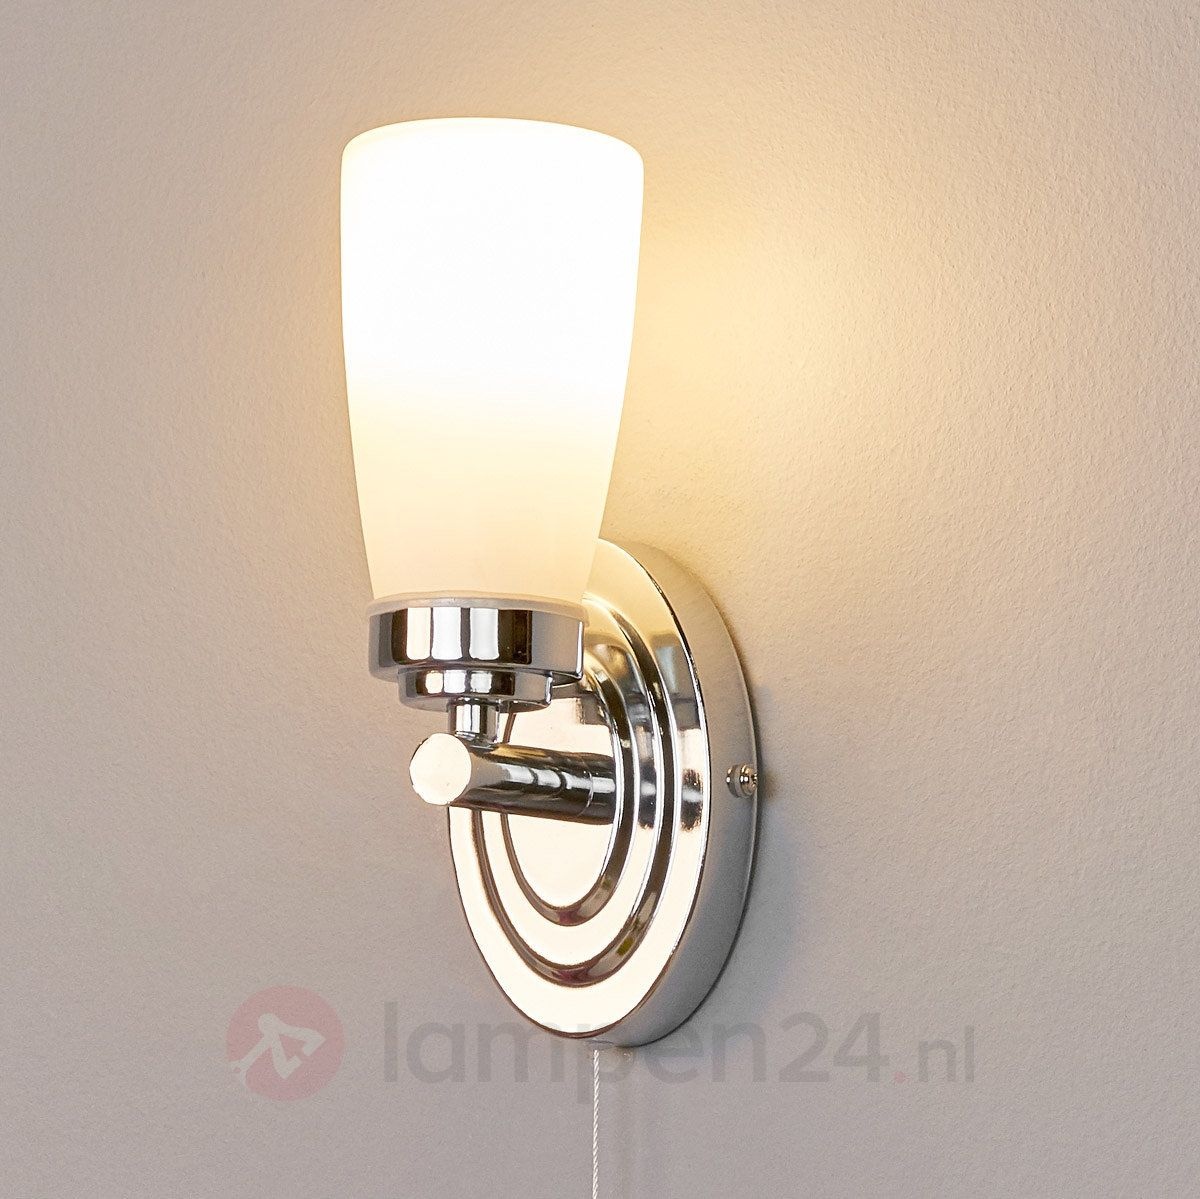 Elegante badkamerlamp Violetta, wandmontage | Pinterest - Wandlamp ...